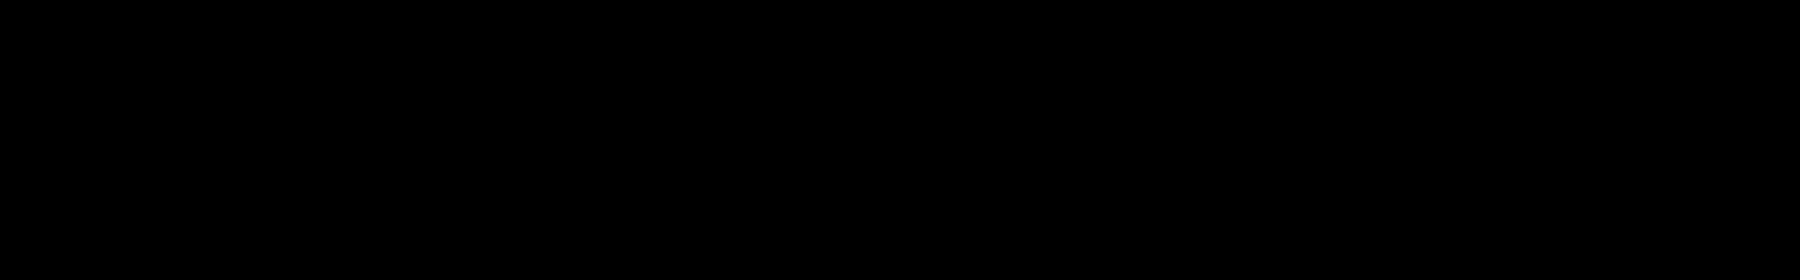 ASTRO SPACES audio waveform